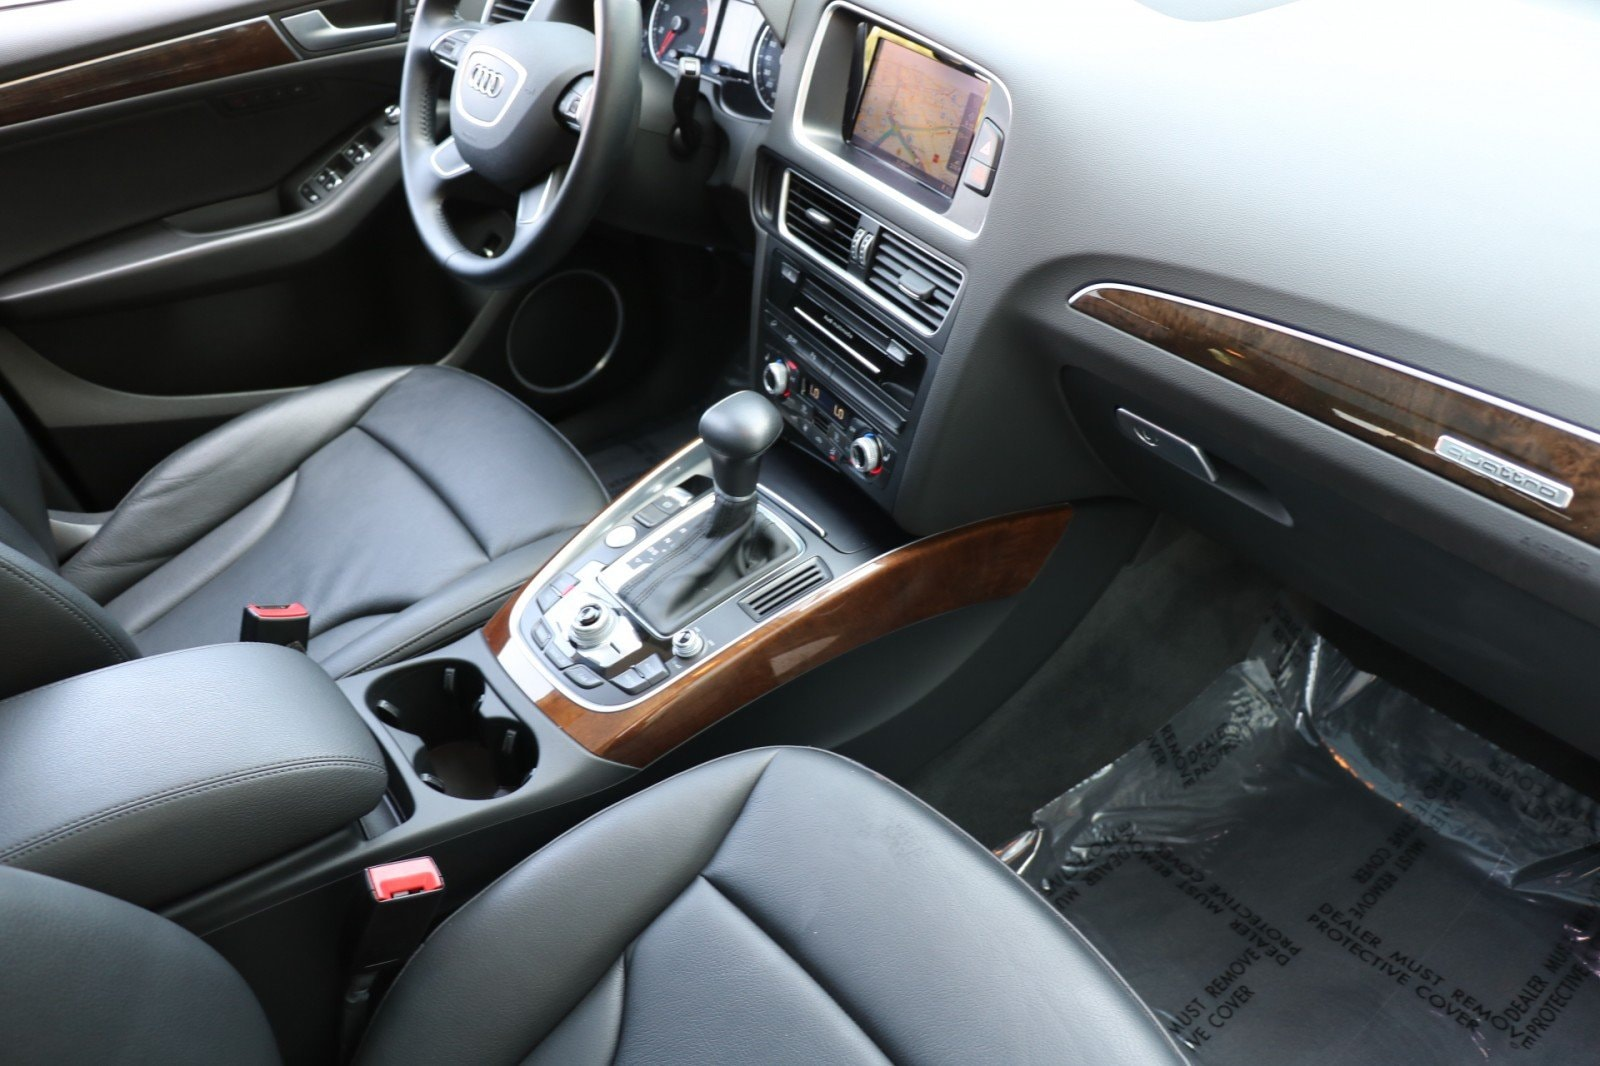 Used 2016 Audi Q5 For Sale at Audi Downtown LA | VIN: WA1L2AFP8GA147022